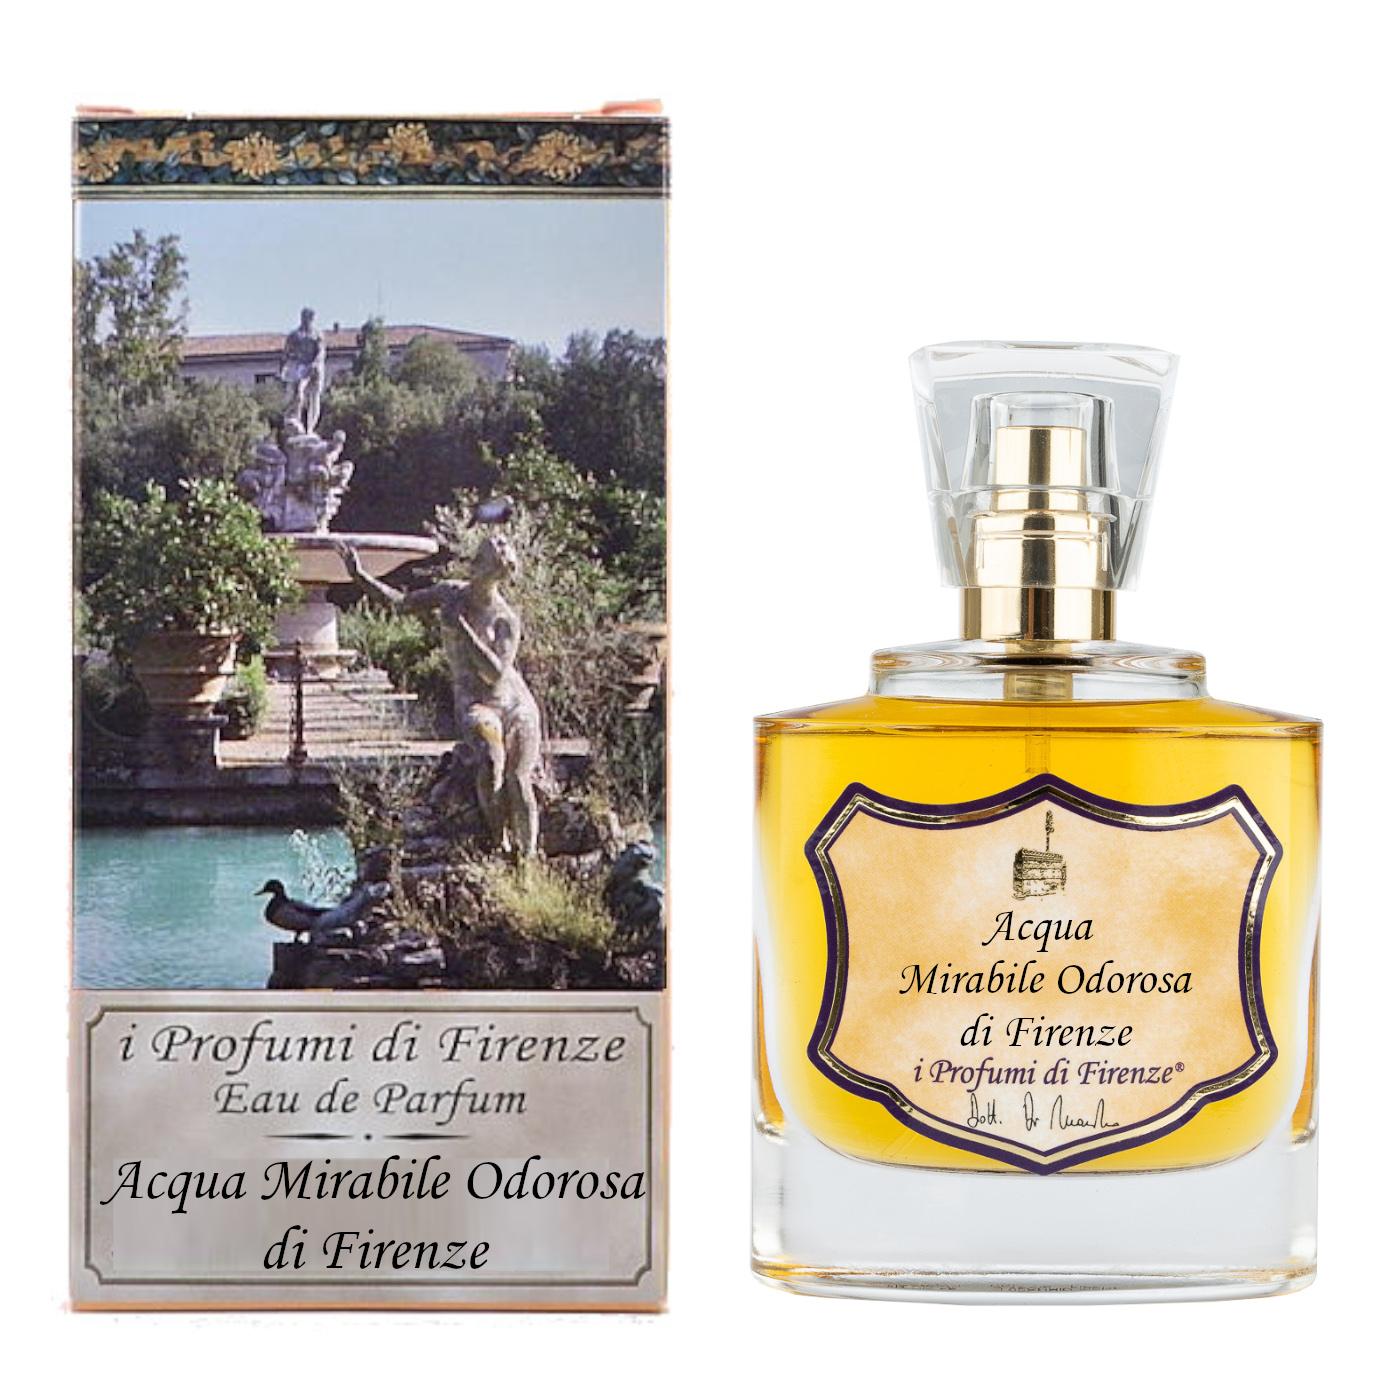 ACQUA MIRABILE ODOROSA DI FIRENZE ®- Eau de Parfum 50ml-0